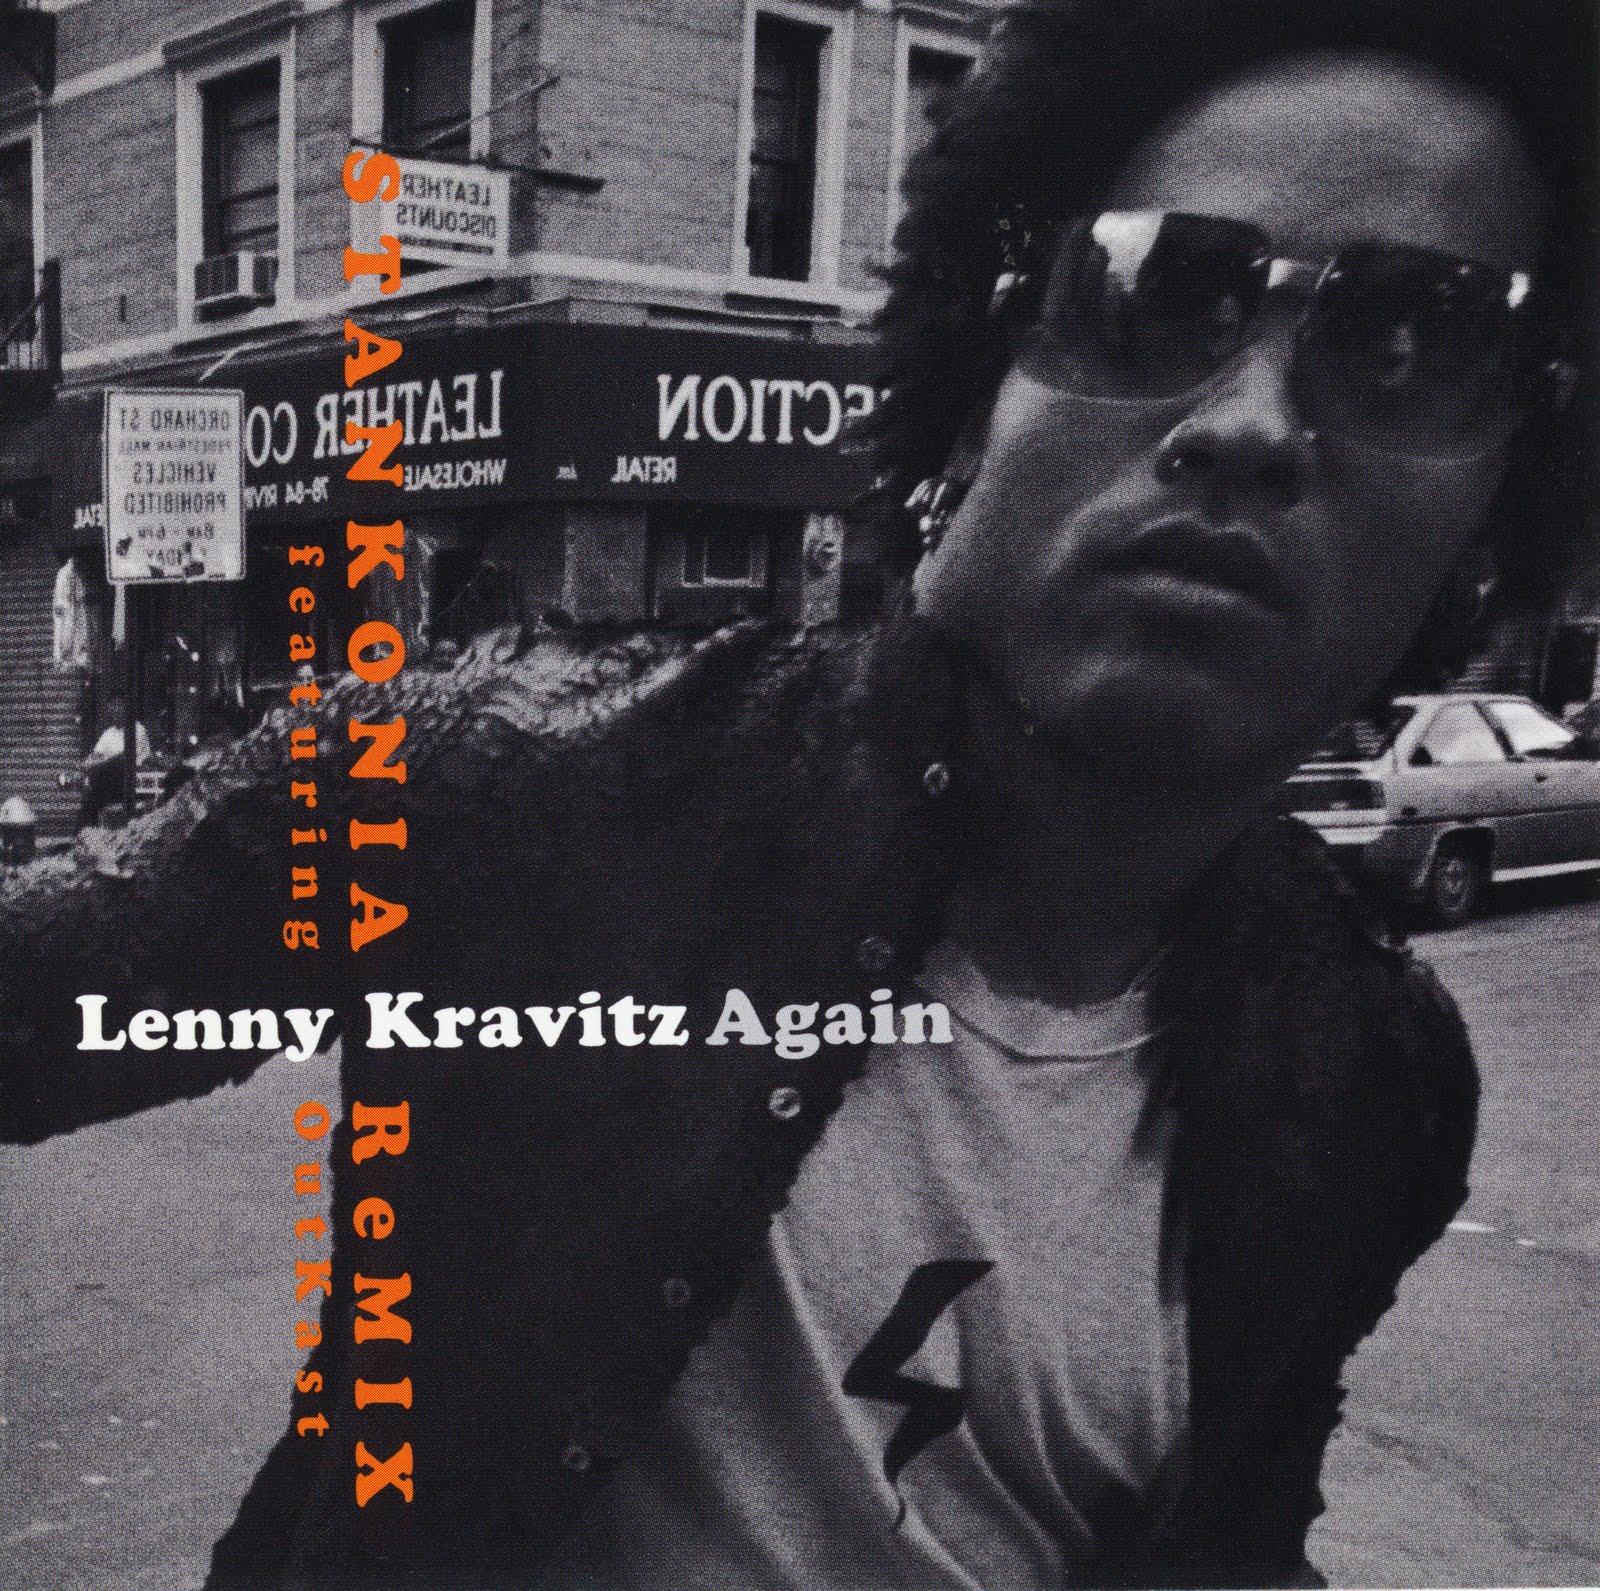 http://2.bp.blogspot.com/-GWnj1FI78Ow/ThPl6y2mqNI/AAAAAAAABpw/GBBiHYVGtyg/s1600/Lenny+Kravitz+Again_0005.jpg